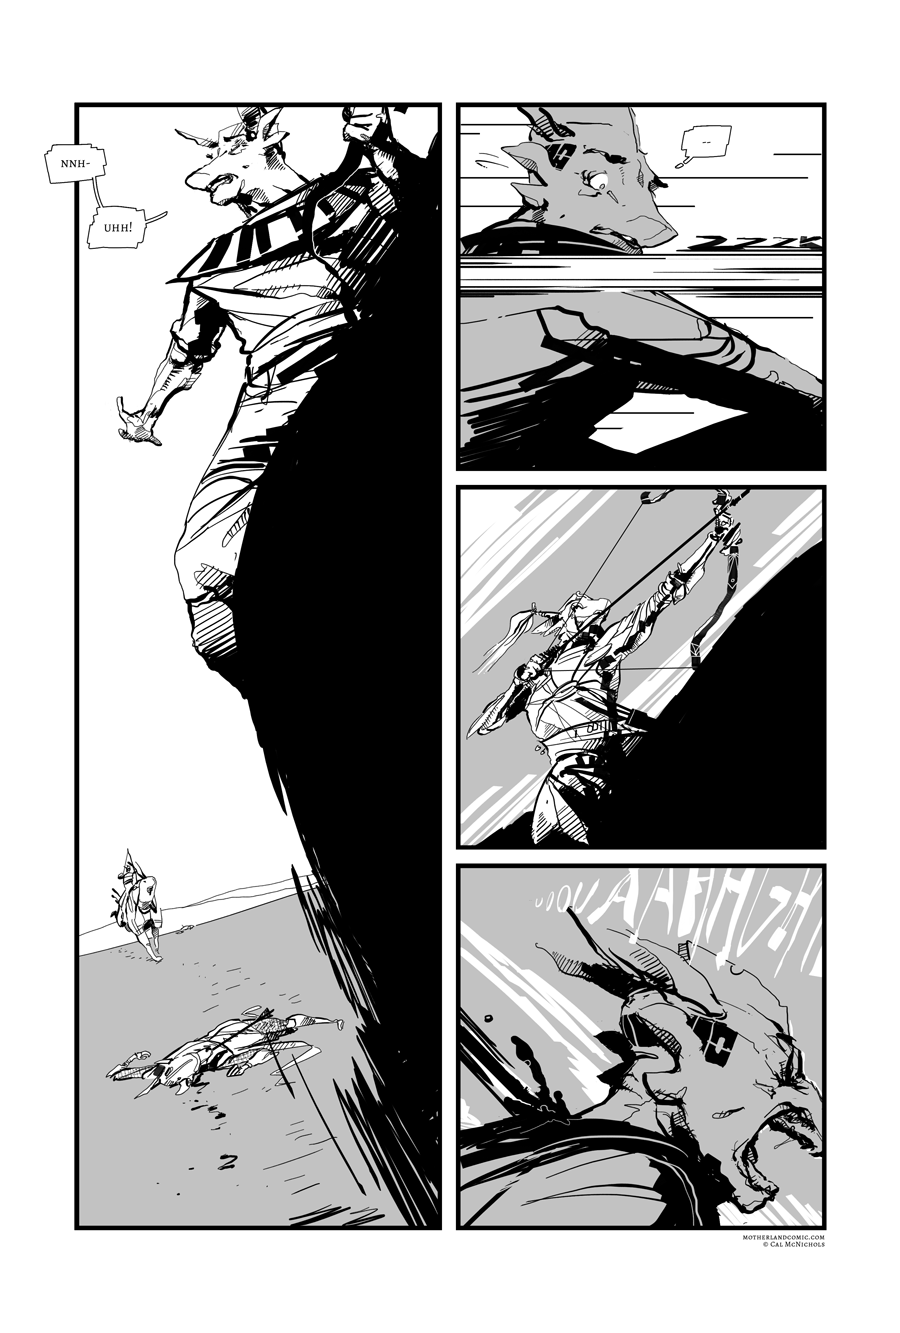 pg 46